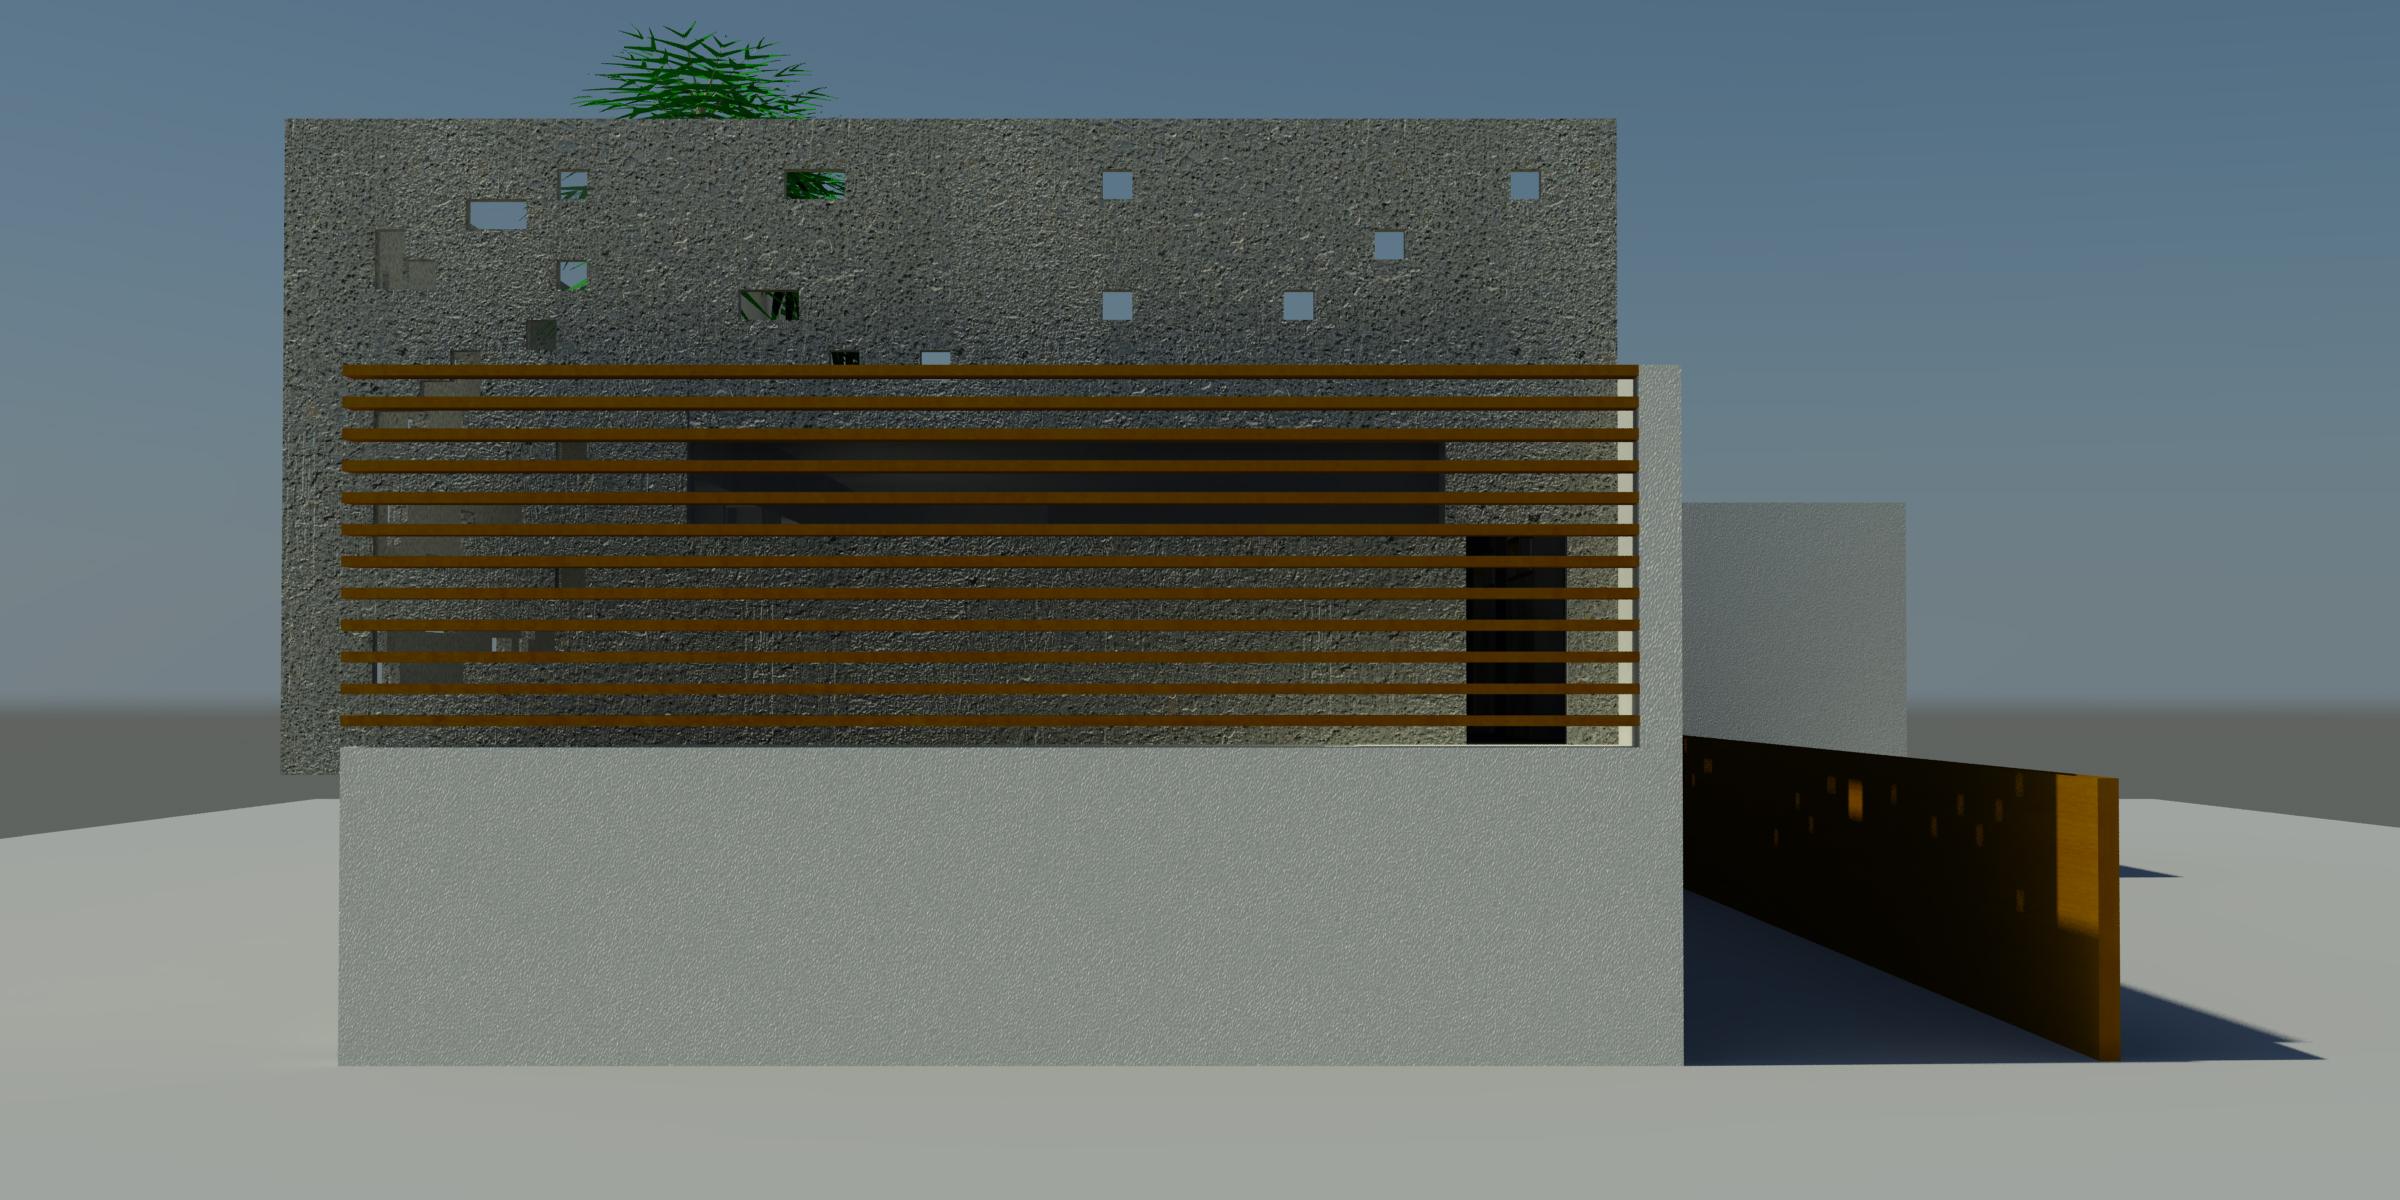 north_facade_june21_0900hrs